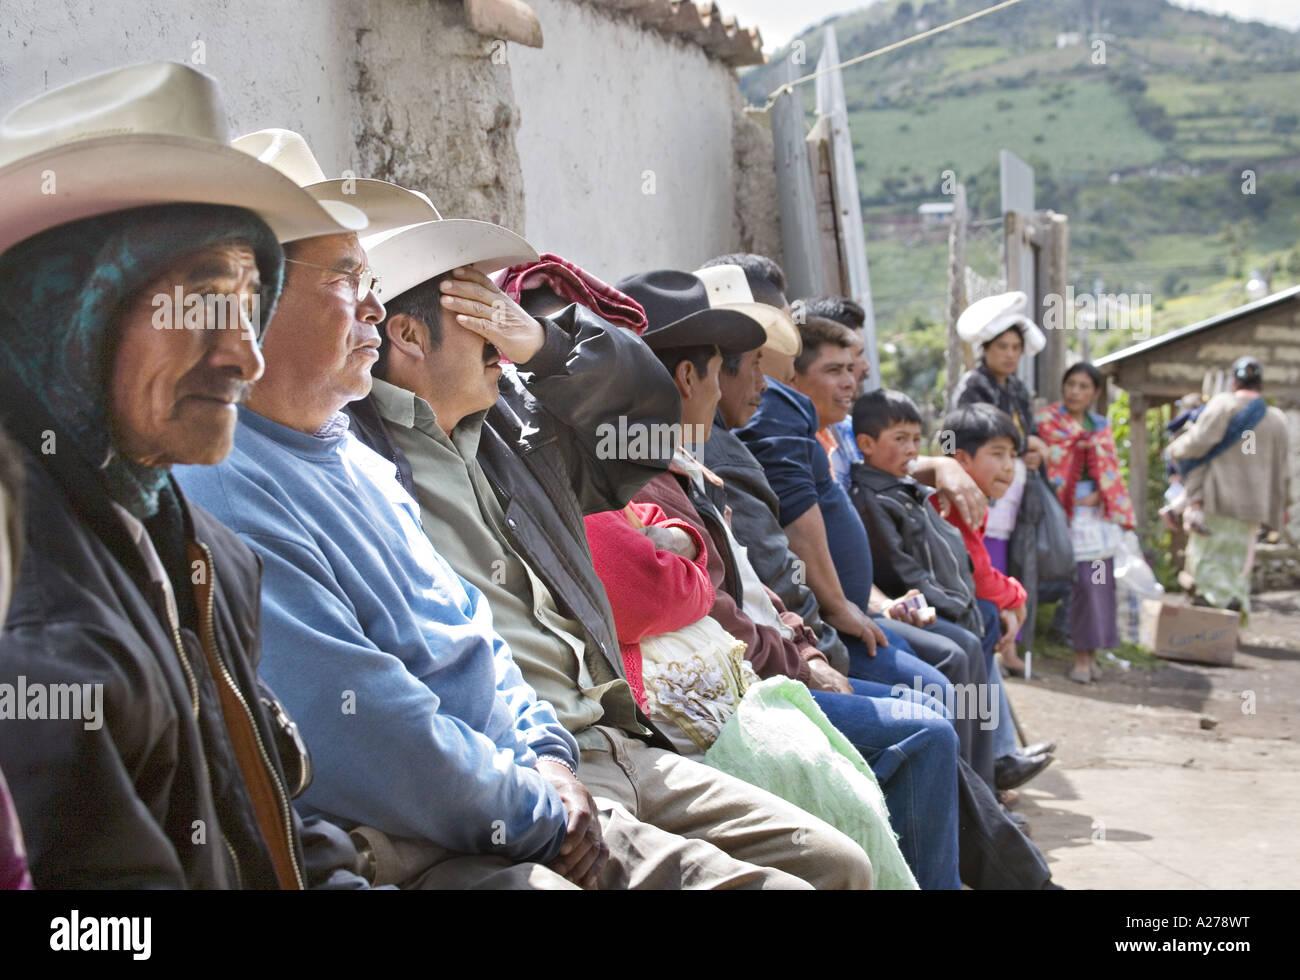 58f5e6e172877 GUATEMALA CAPELLANIA indígenas maya Quiche hombres en sombreros de vaqueros  a la espera de ser atendidos en la clínica médica